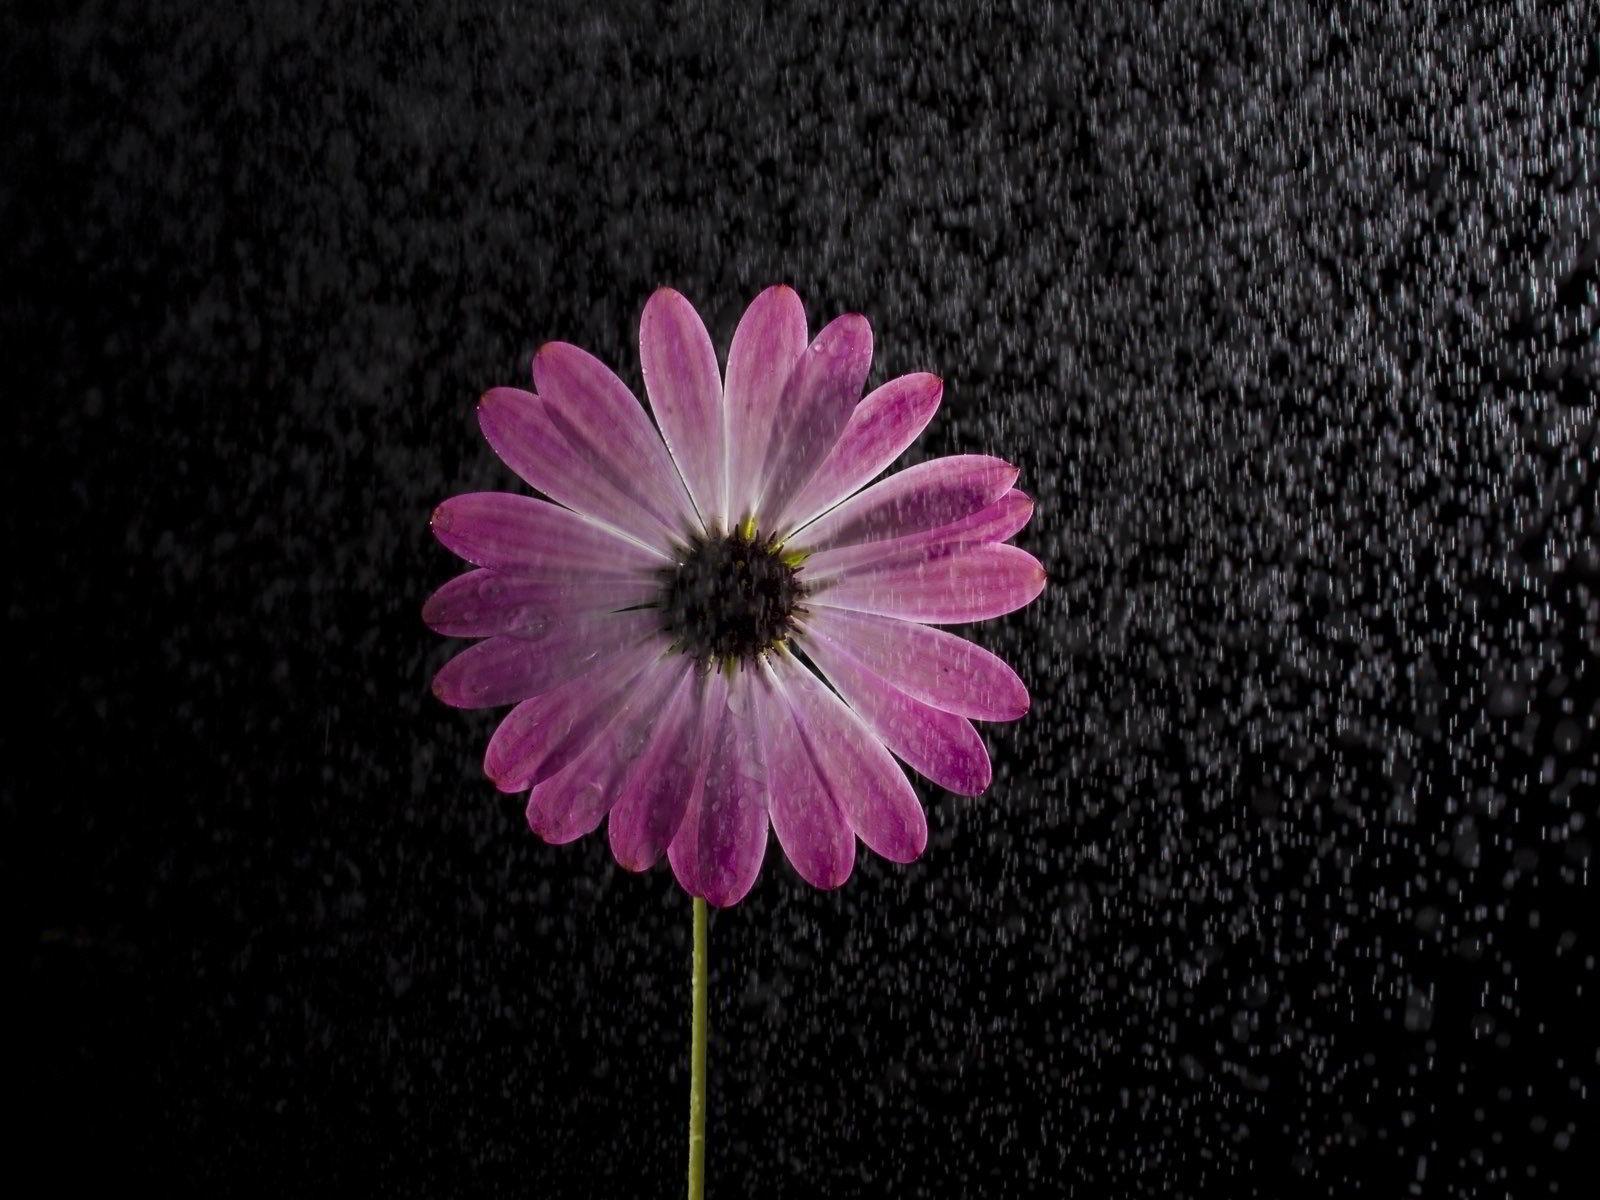 hinh anh hoa cuc dep 55